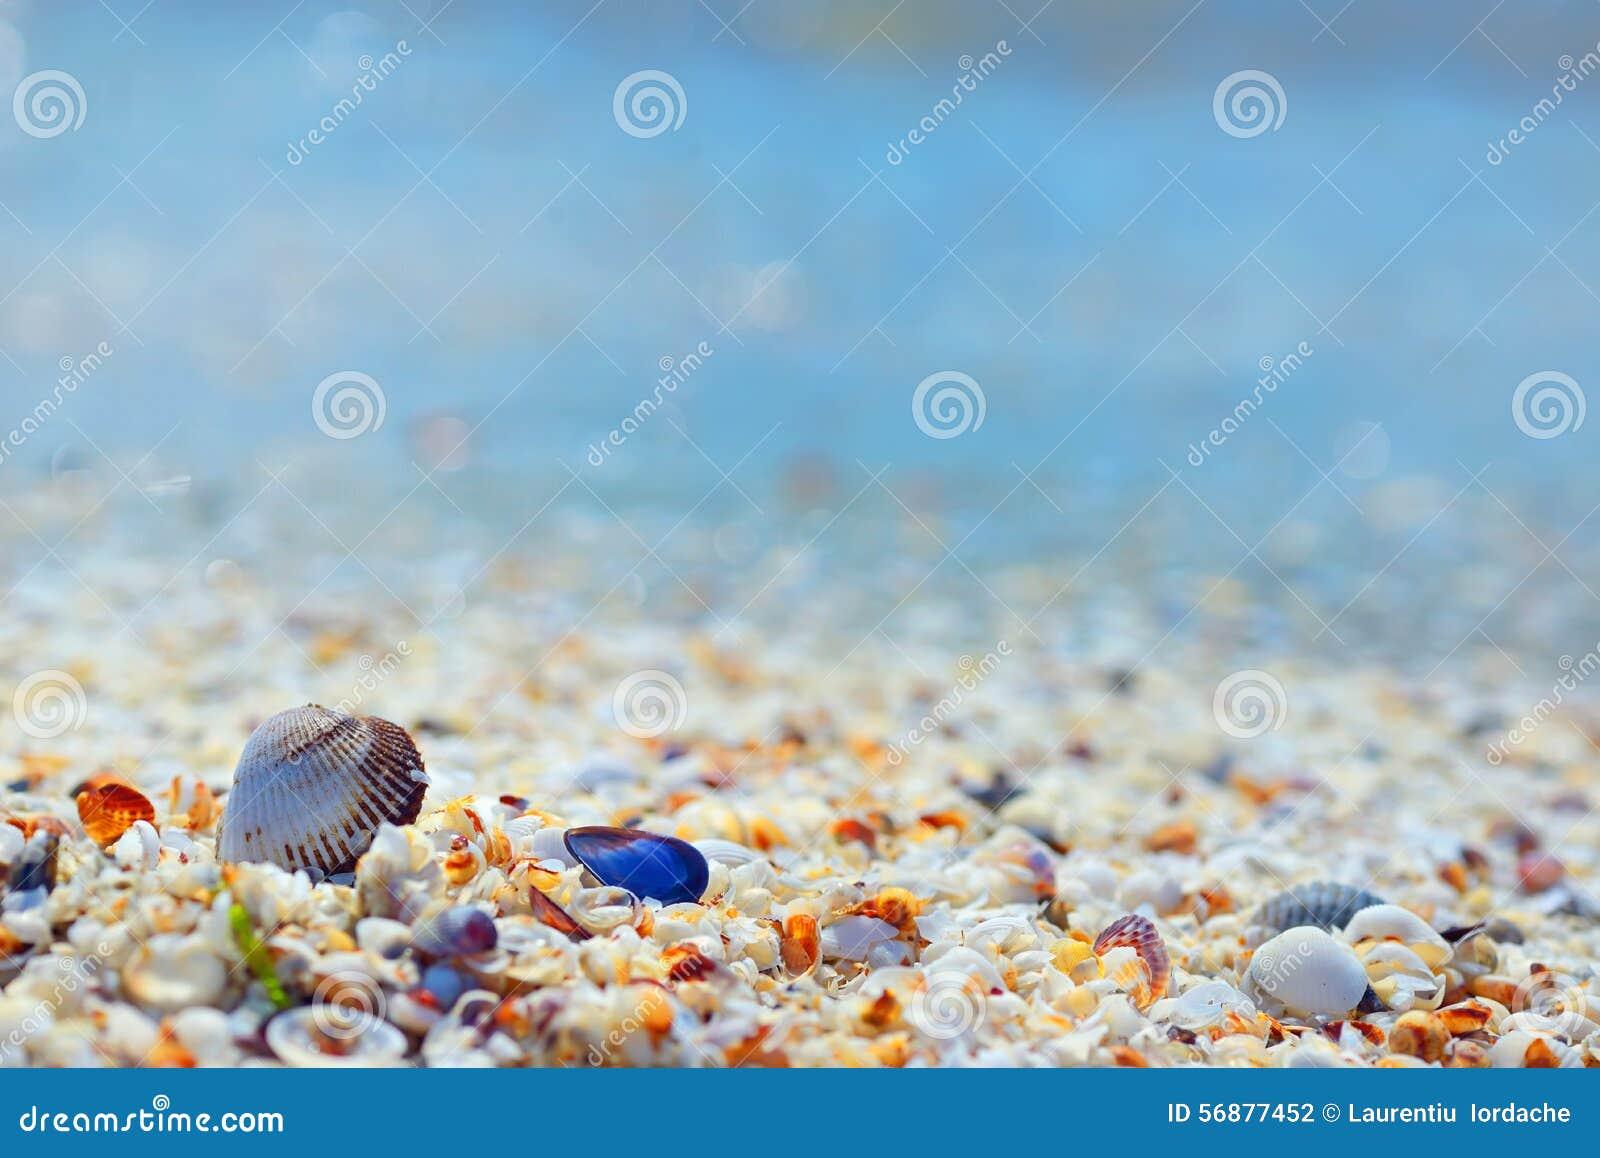 Coperture e sabbia